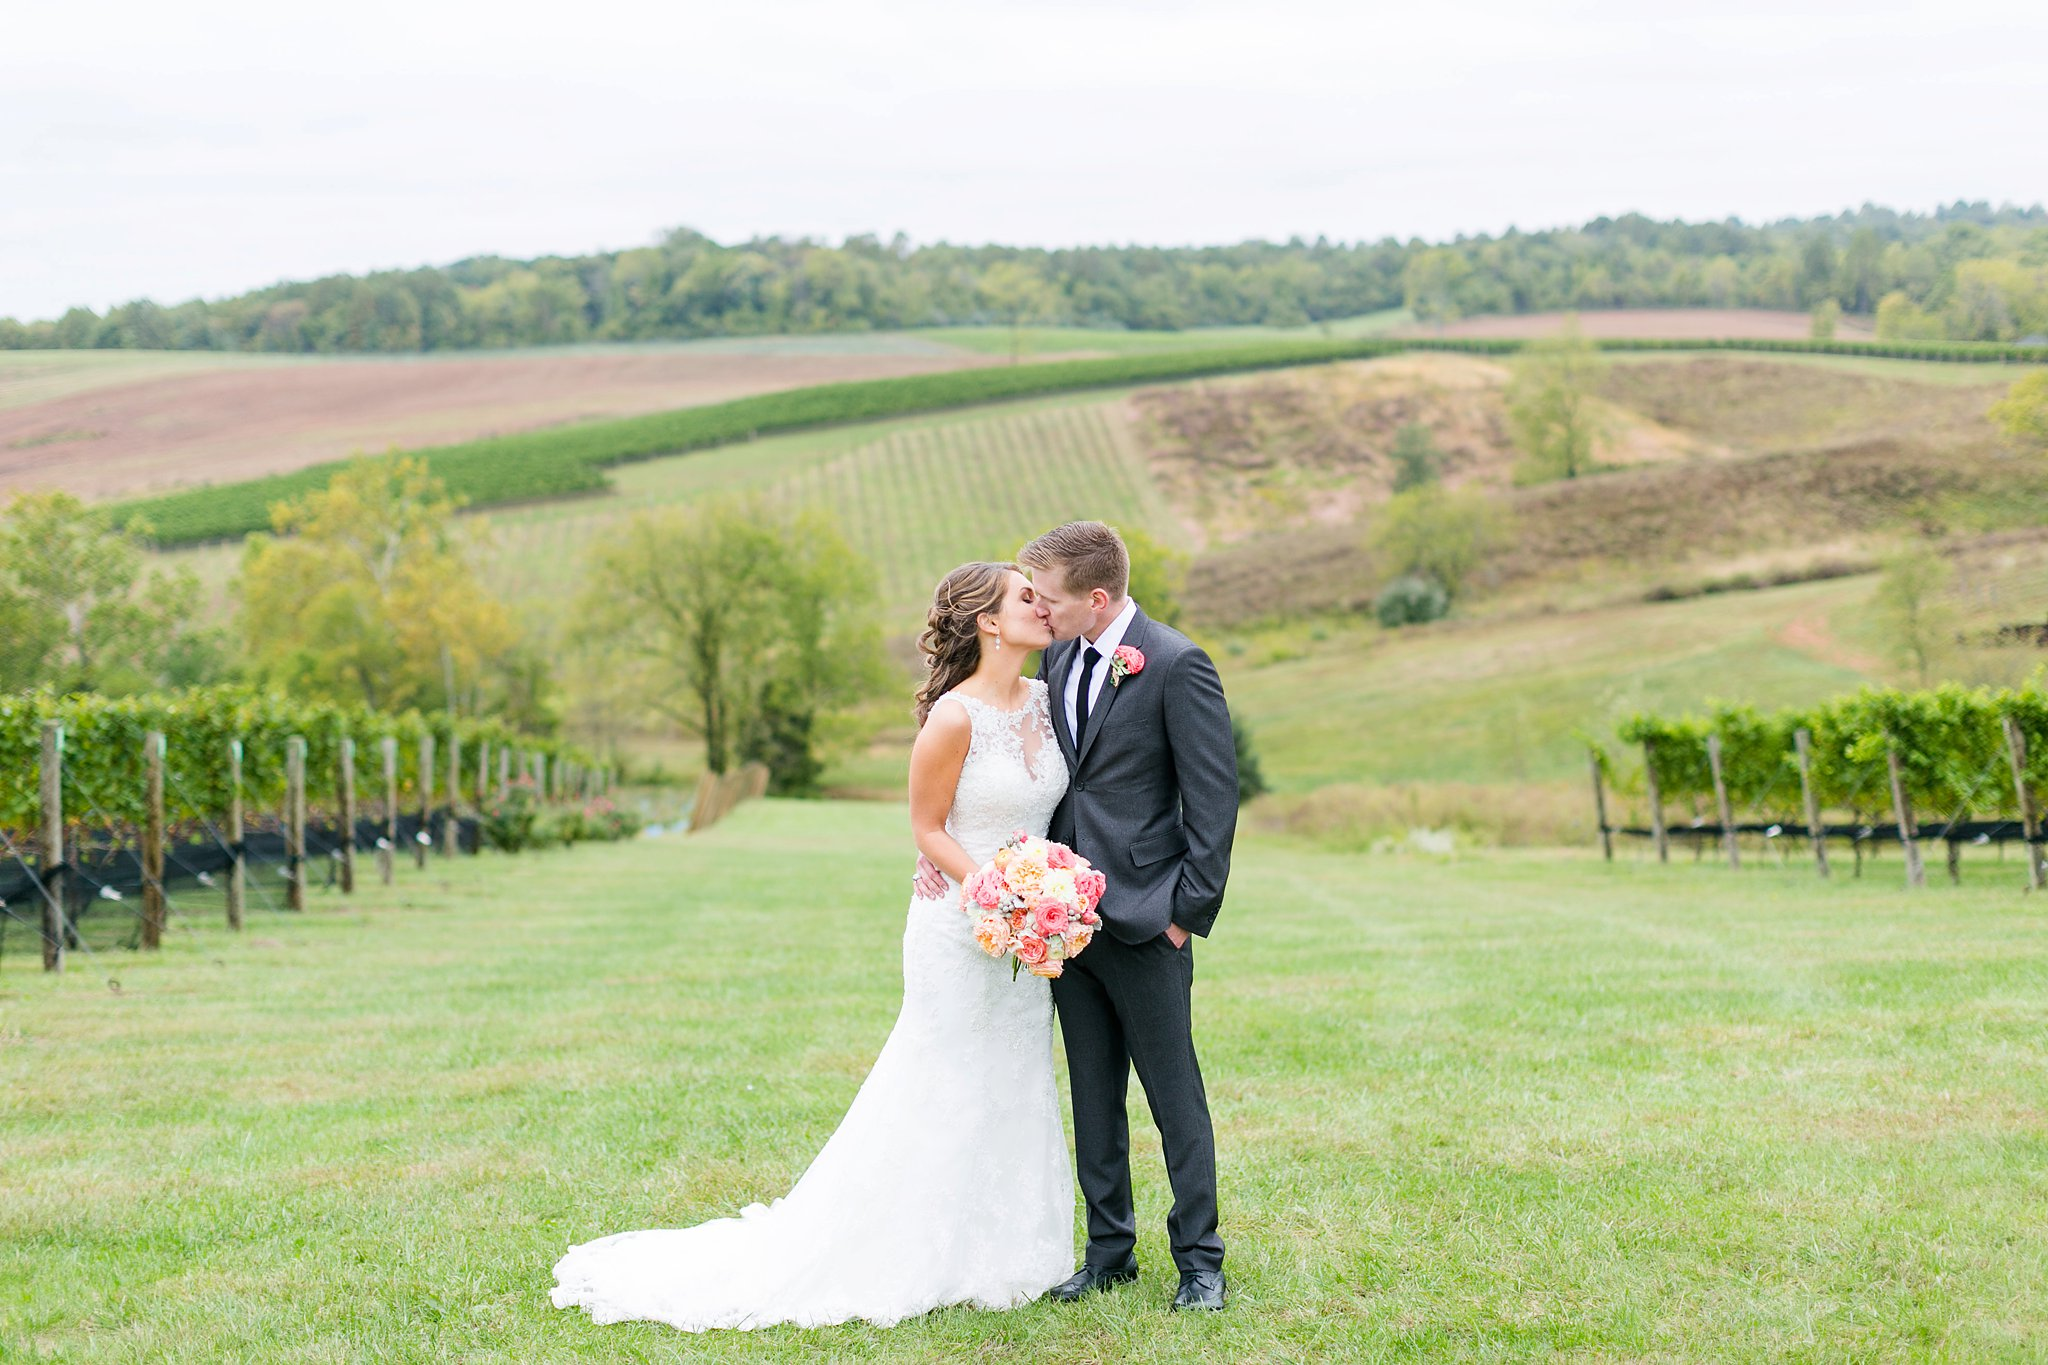 Stone Tower Winery Wedding Photos Virginia Wedding Photographer Megan Kelsey Photography Sam & Angela-224.jpg